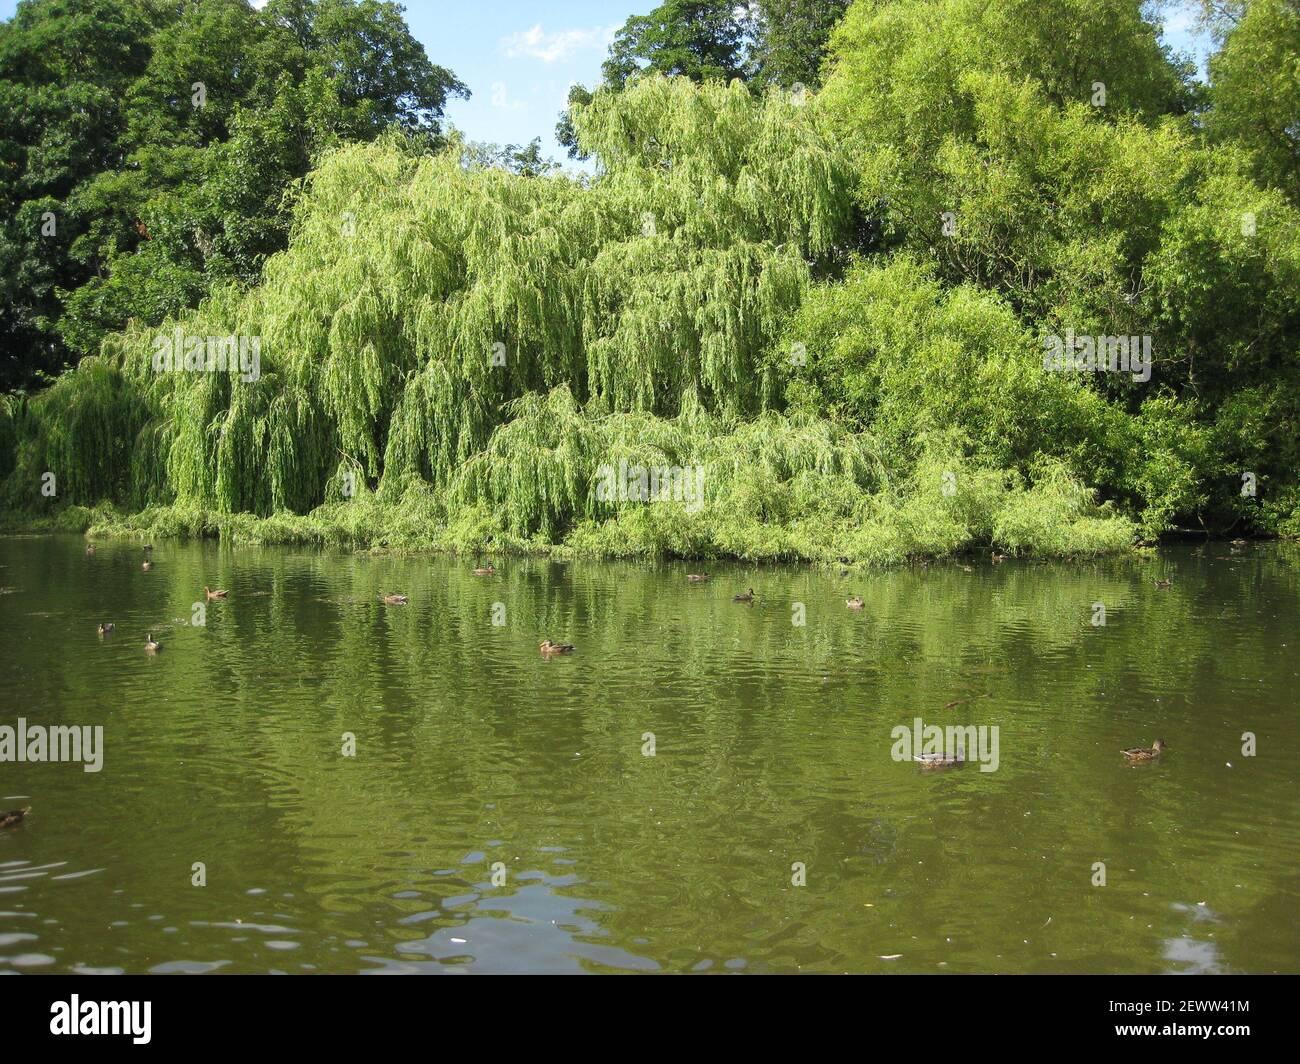 Vistas al lago de Thwaite Hall Gardens en Cottingham, East Yorkshire Foto de stock